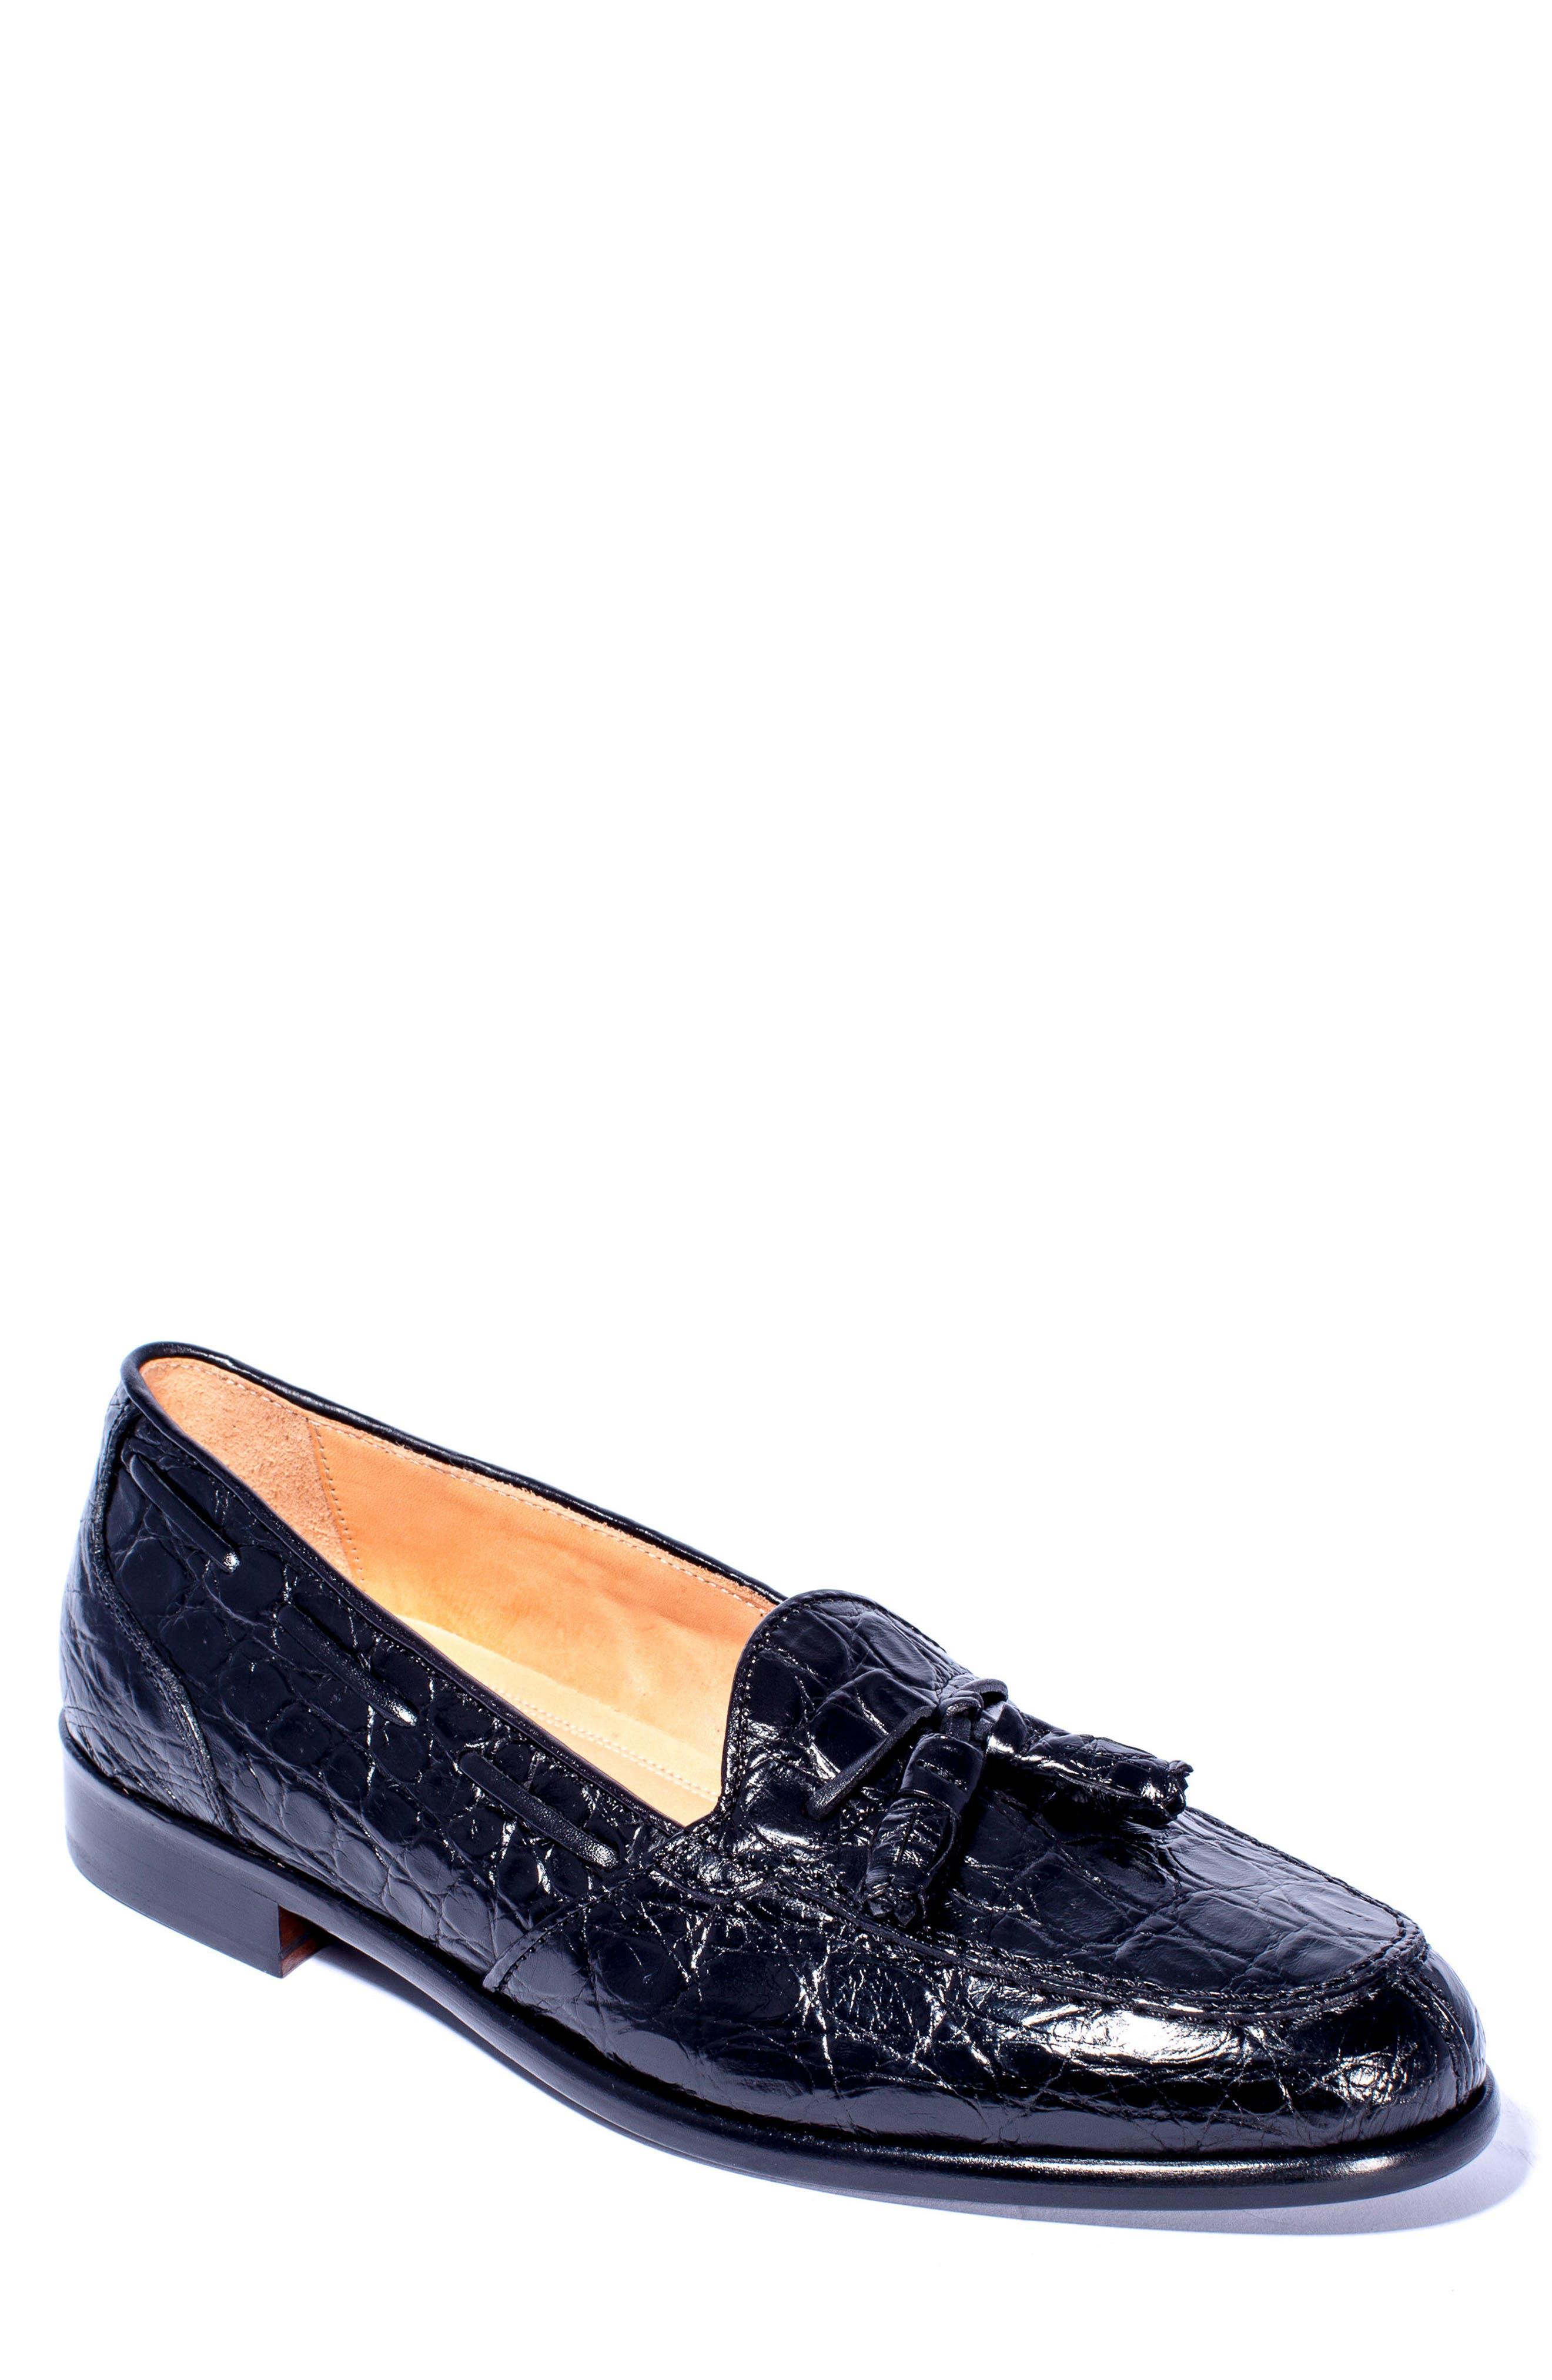 Franco Tassel Exotic Leather Loafer,                         Main,                         color, 001